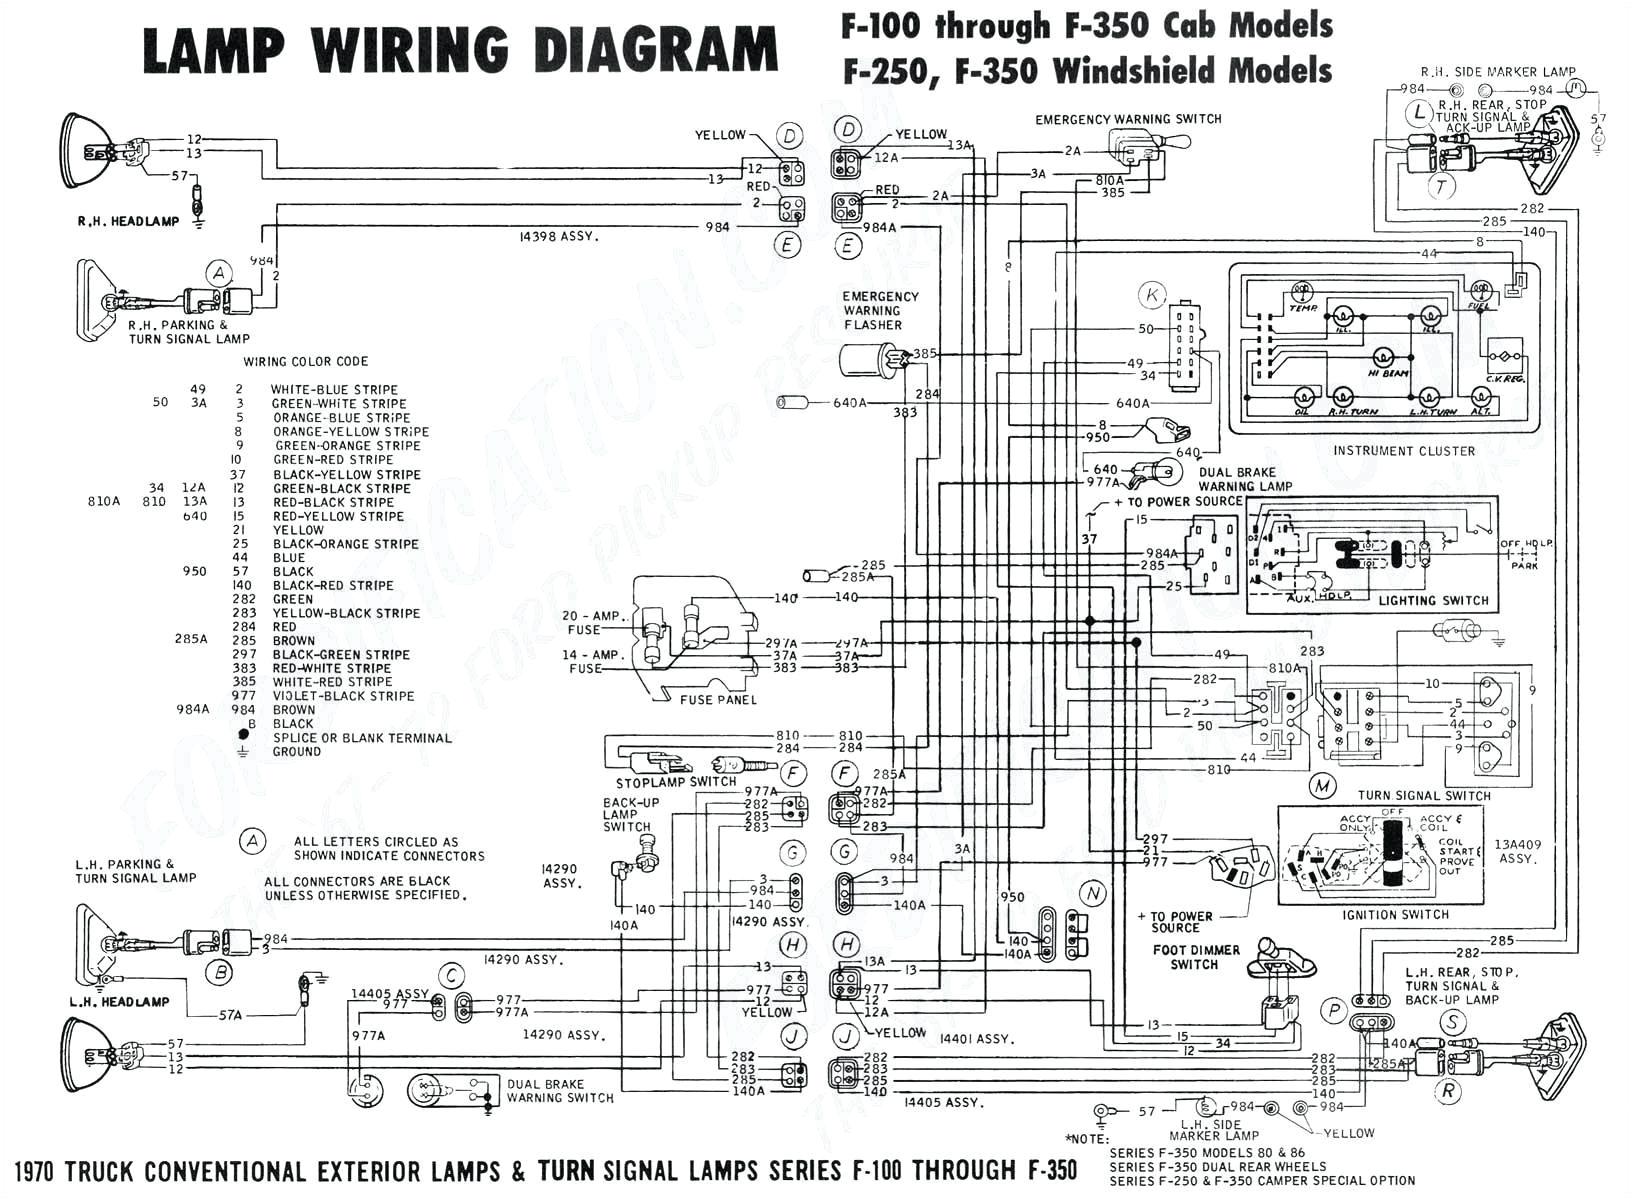 2006 sterling fuse diagram wiring diagram datasource ford dump truck wiring diagram dump truck wiring diagram